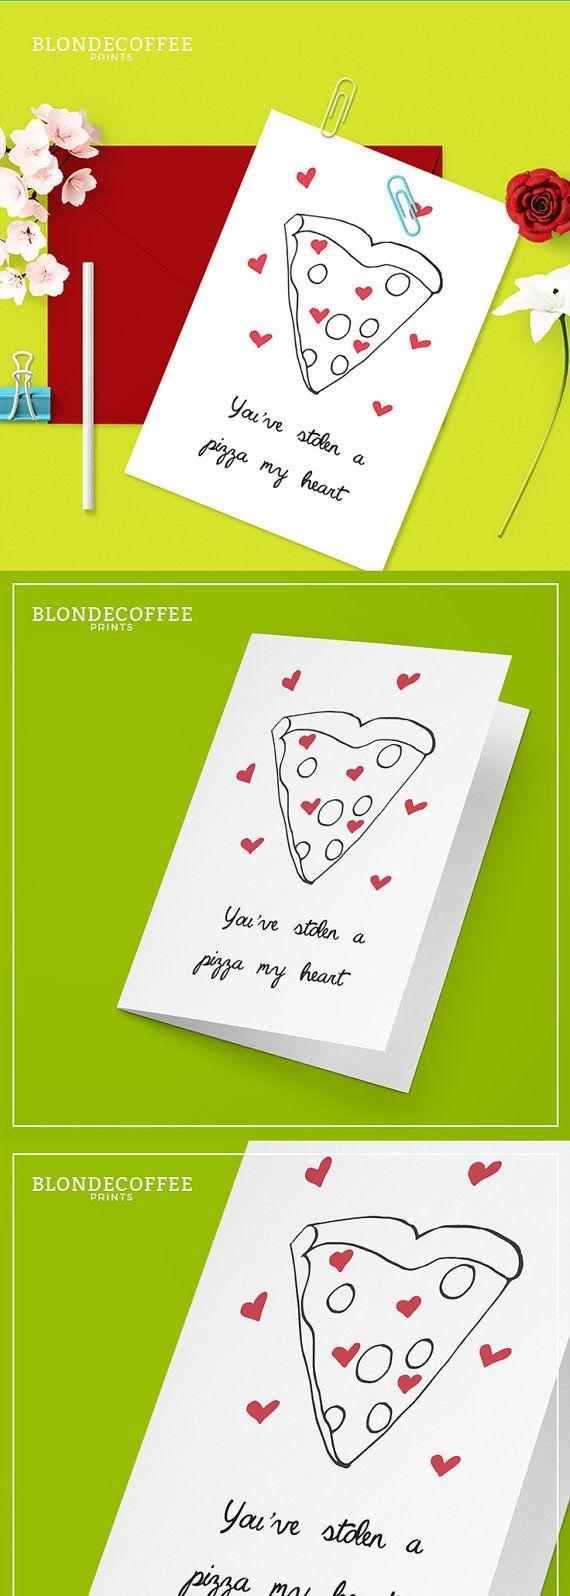 good valentine's day puns